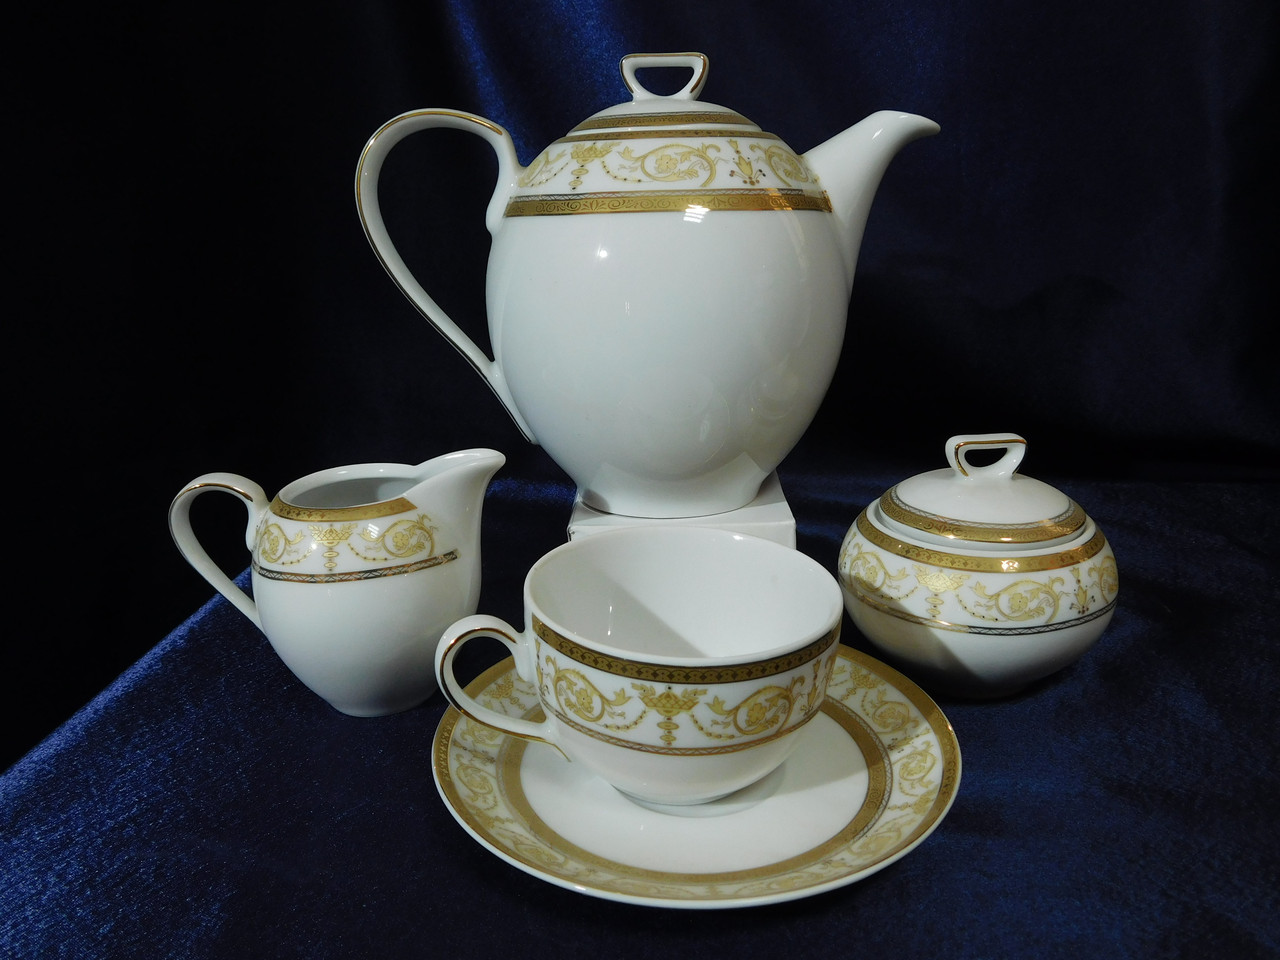 Чайный сервиз Cmielow Yvonne 9968 на 6 персон 15 предметов (6028)